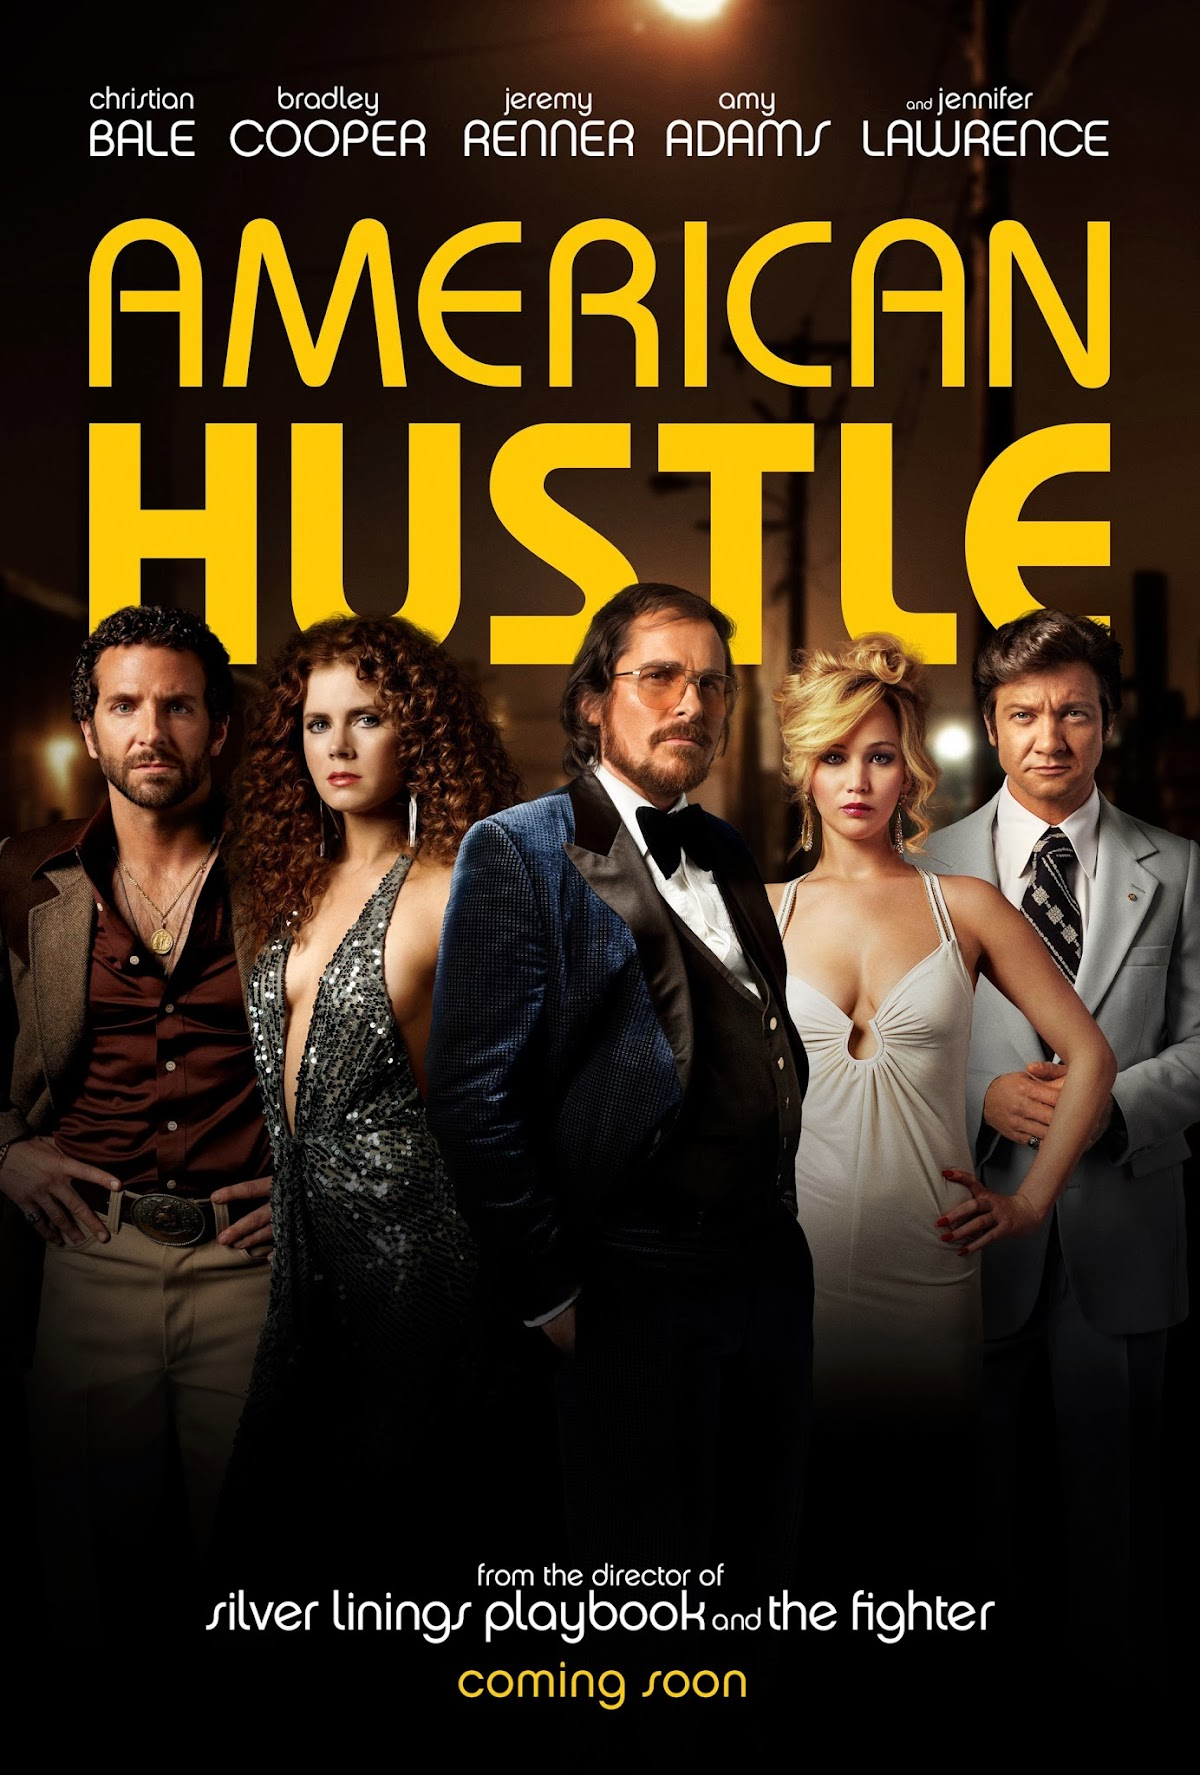 http://3.bp.blogspot.com/-NaVL6ELu5Uo/Us5zzUyomjI/AAAAAAAAnF4/9T2EsHYiOR0/s1775/american-hustle-poster-2.jpg